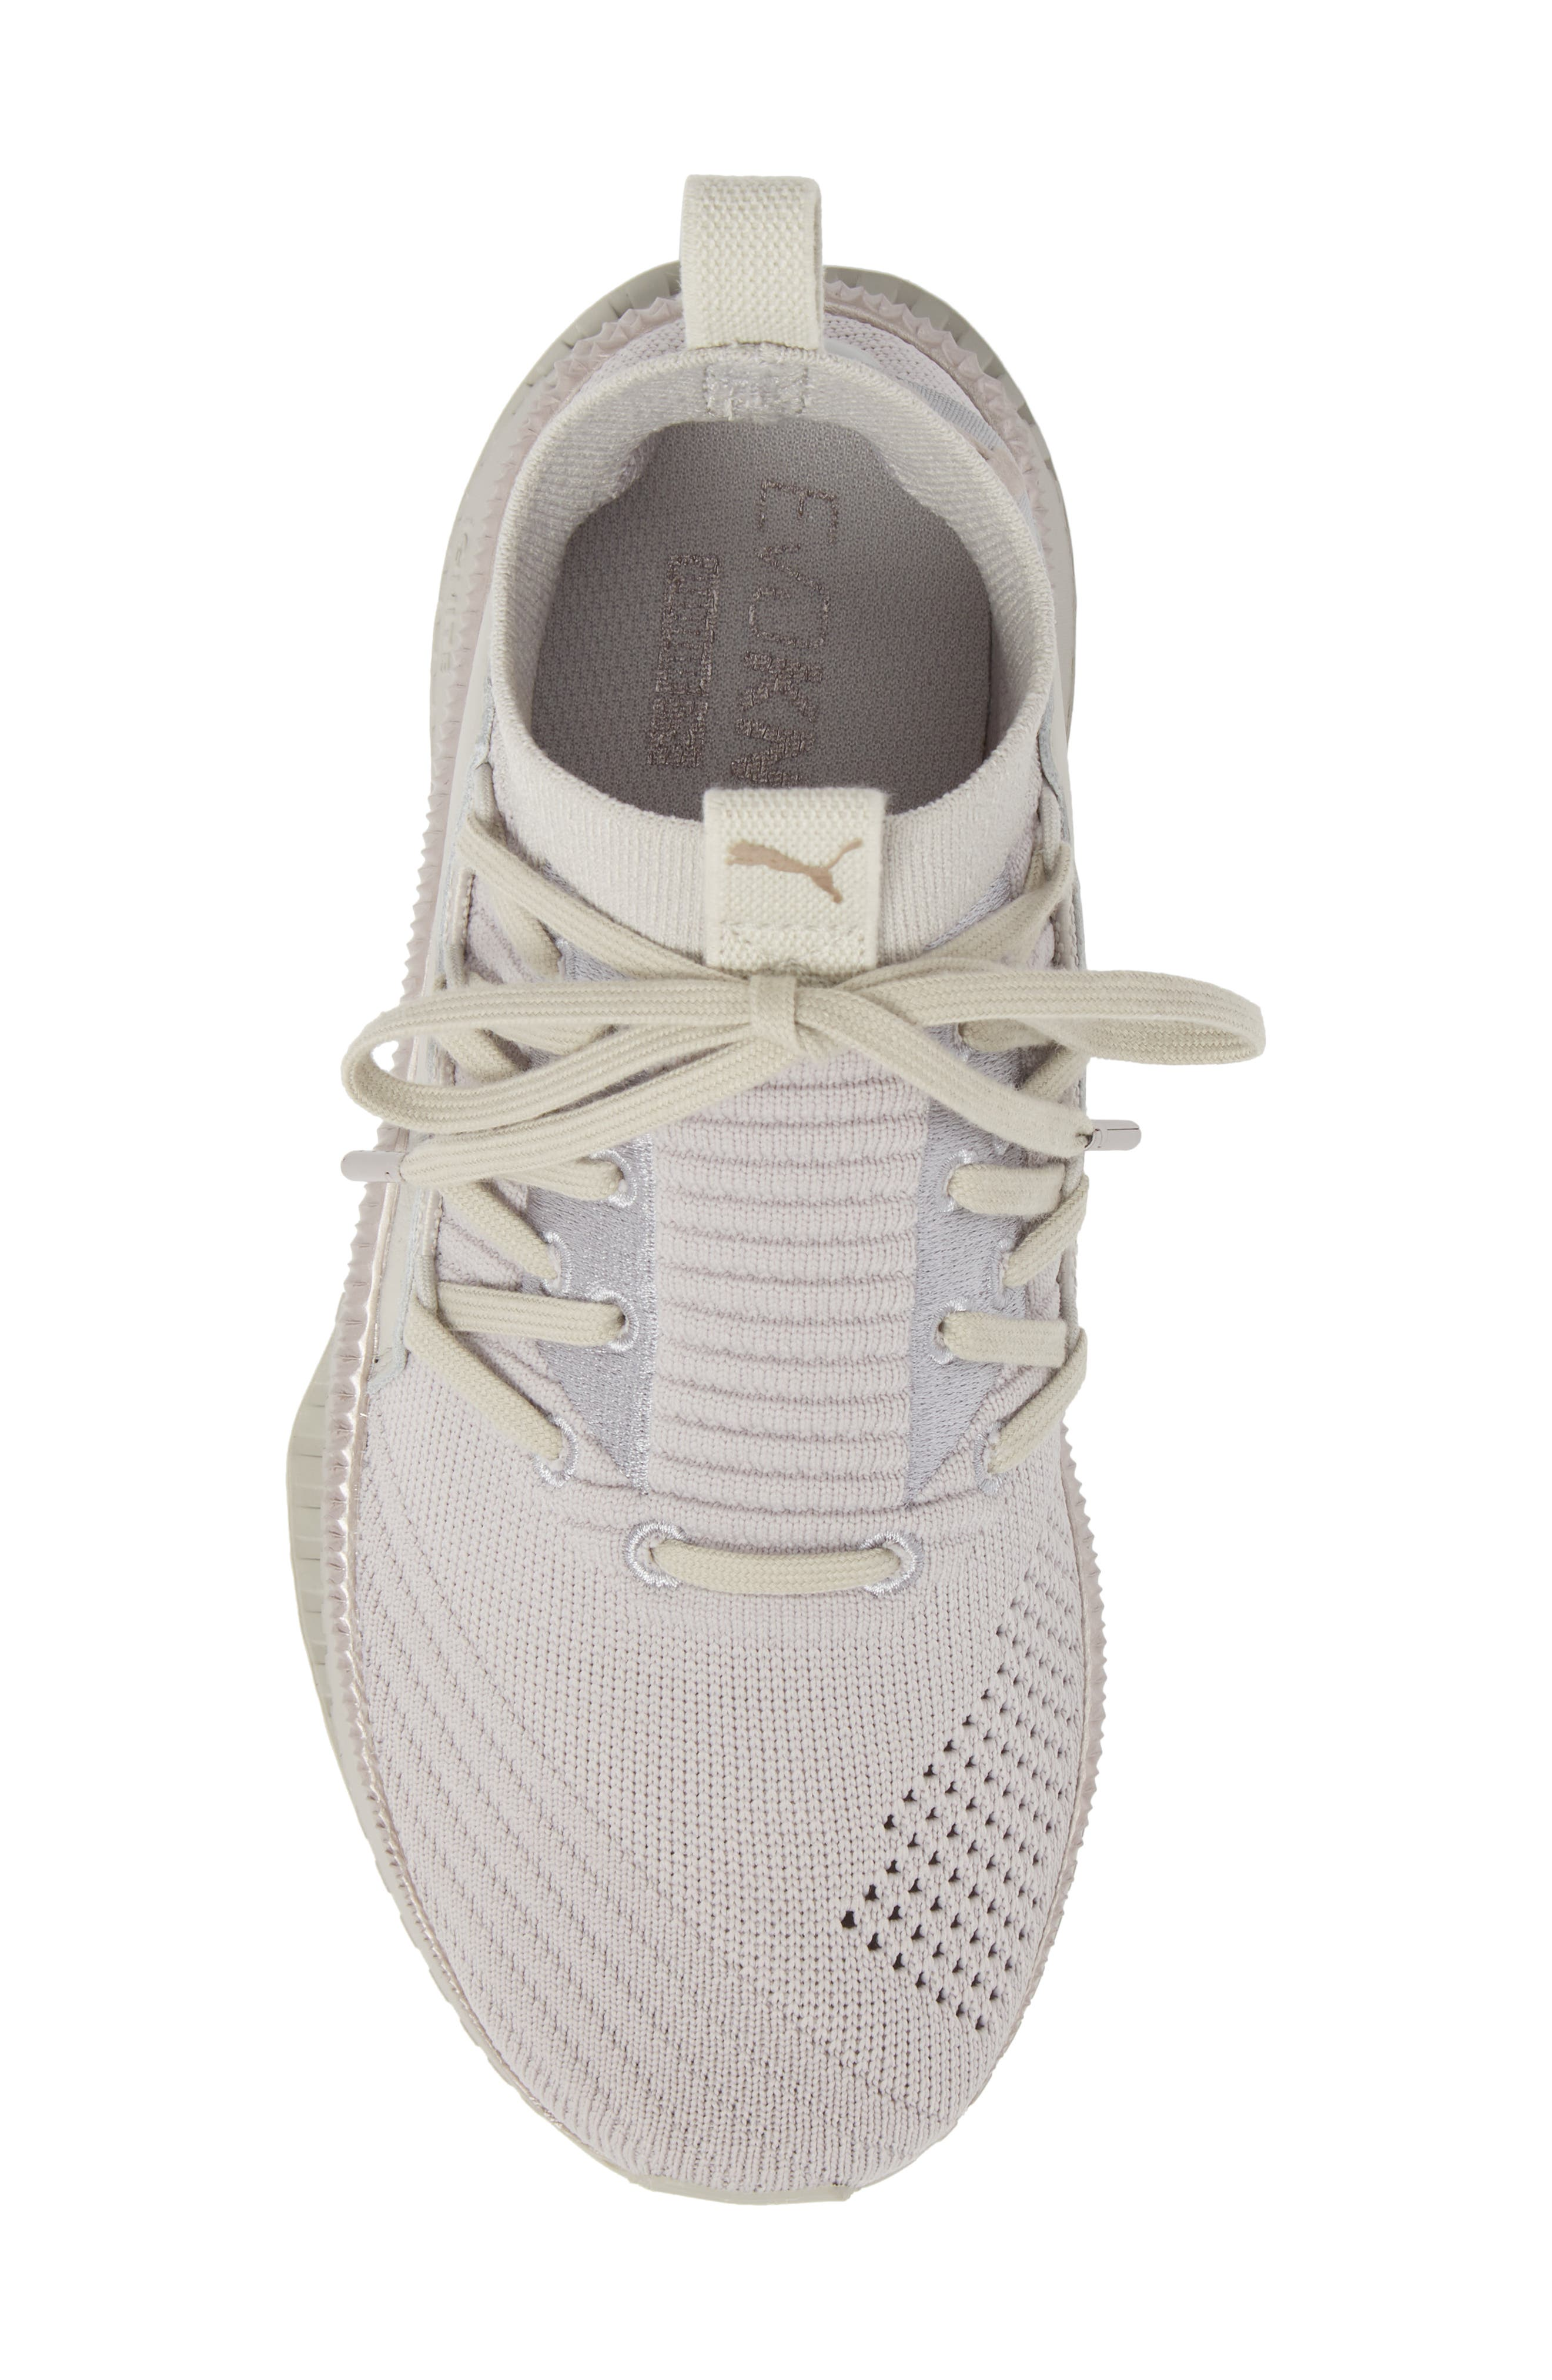 Tsugi Jun Training Shoe,                             Alternate thumbnail 5, color,                             Gray Violet/ Metallic Beige